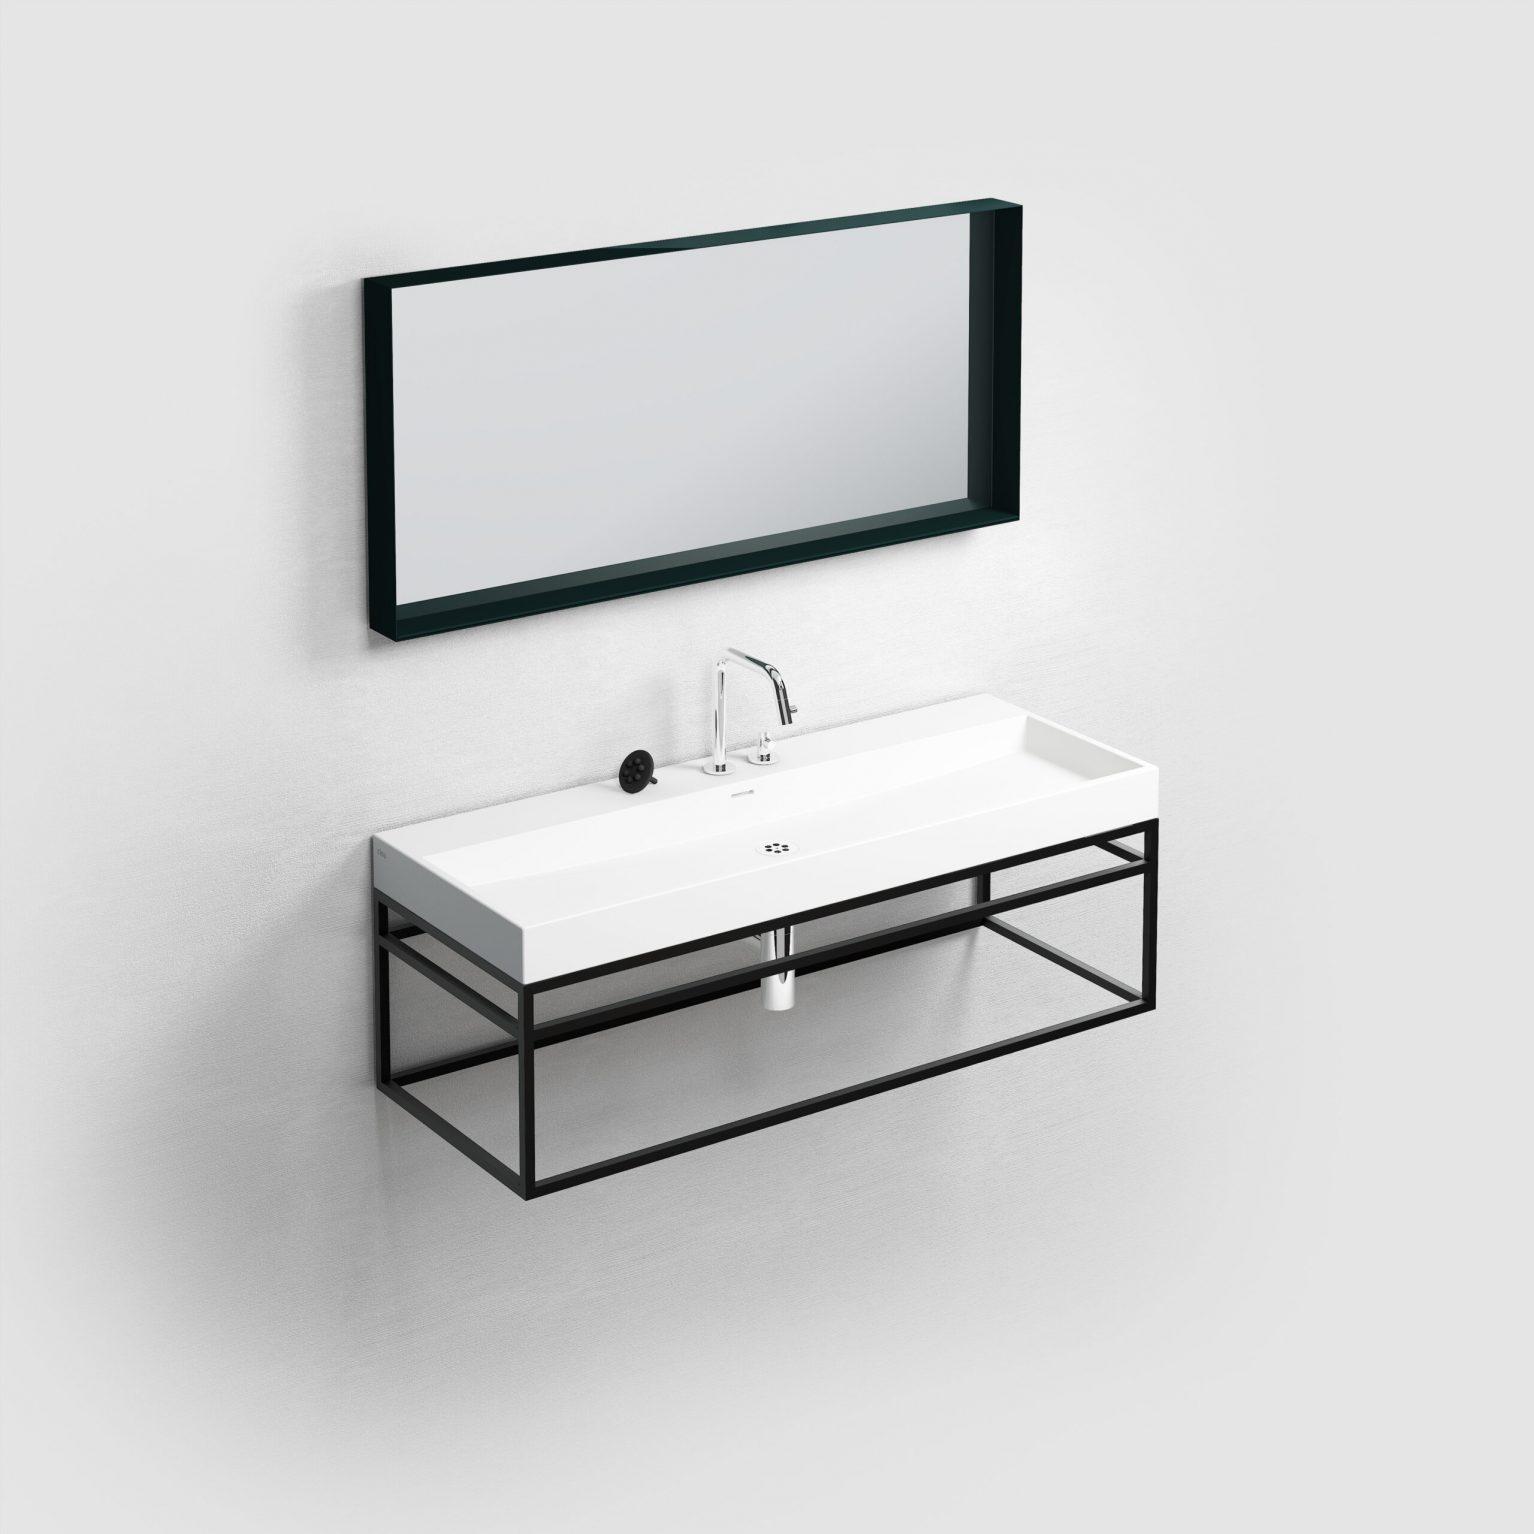 (New) Wash Me Frame rvs kokerprof. 110 cm, mat zw. poederlak)